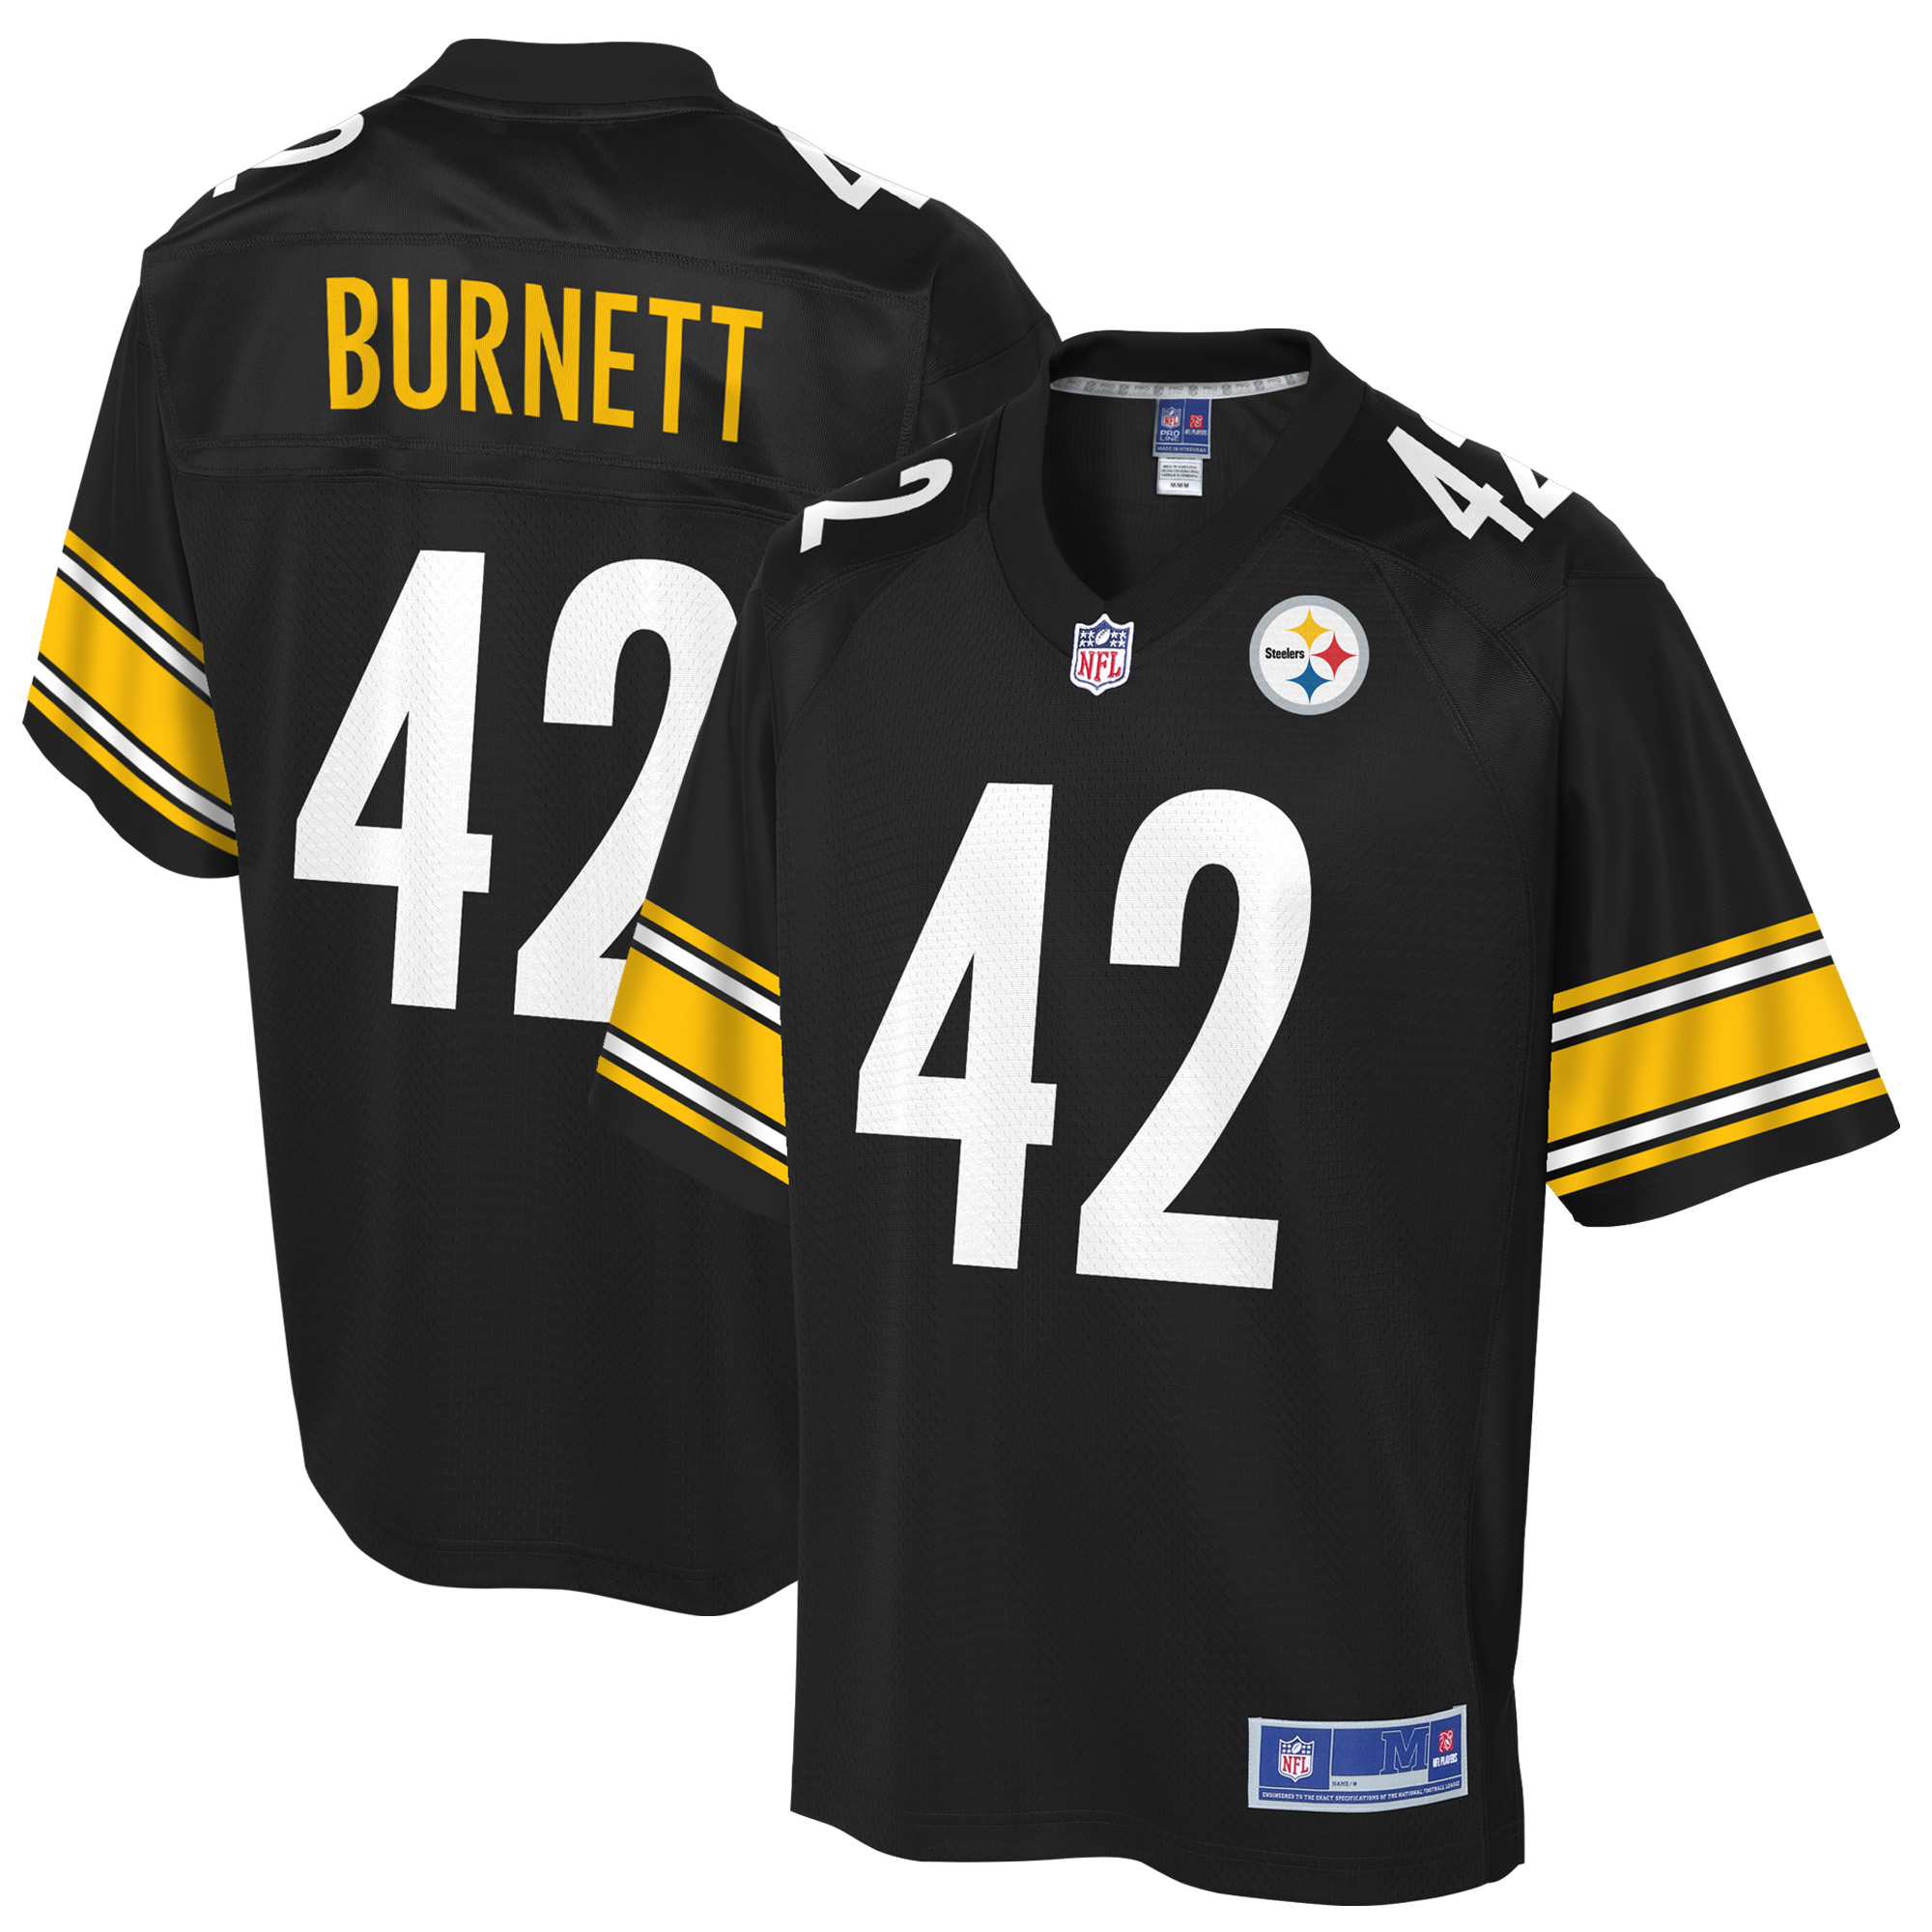 brand new e4361 6bdb1 Morgan Burnett Pittsburgh Steelers NFL Pro Line Youth Player ...